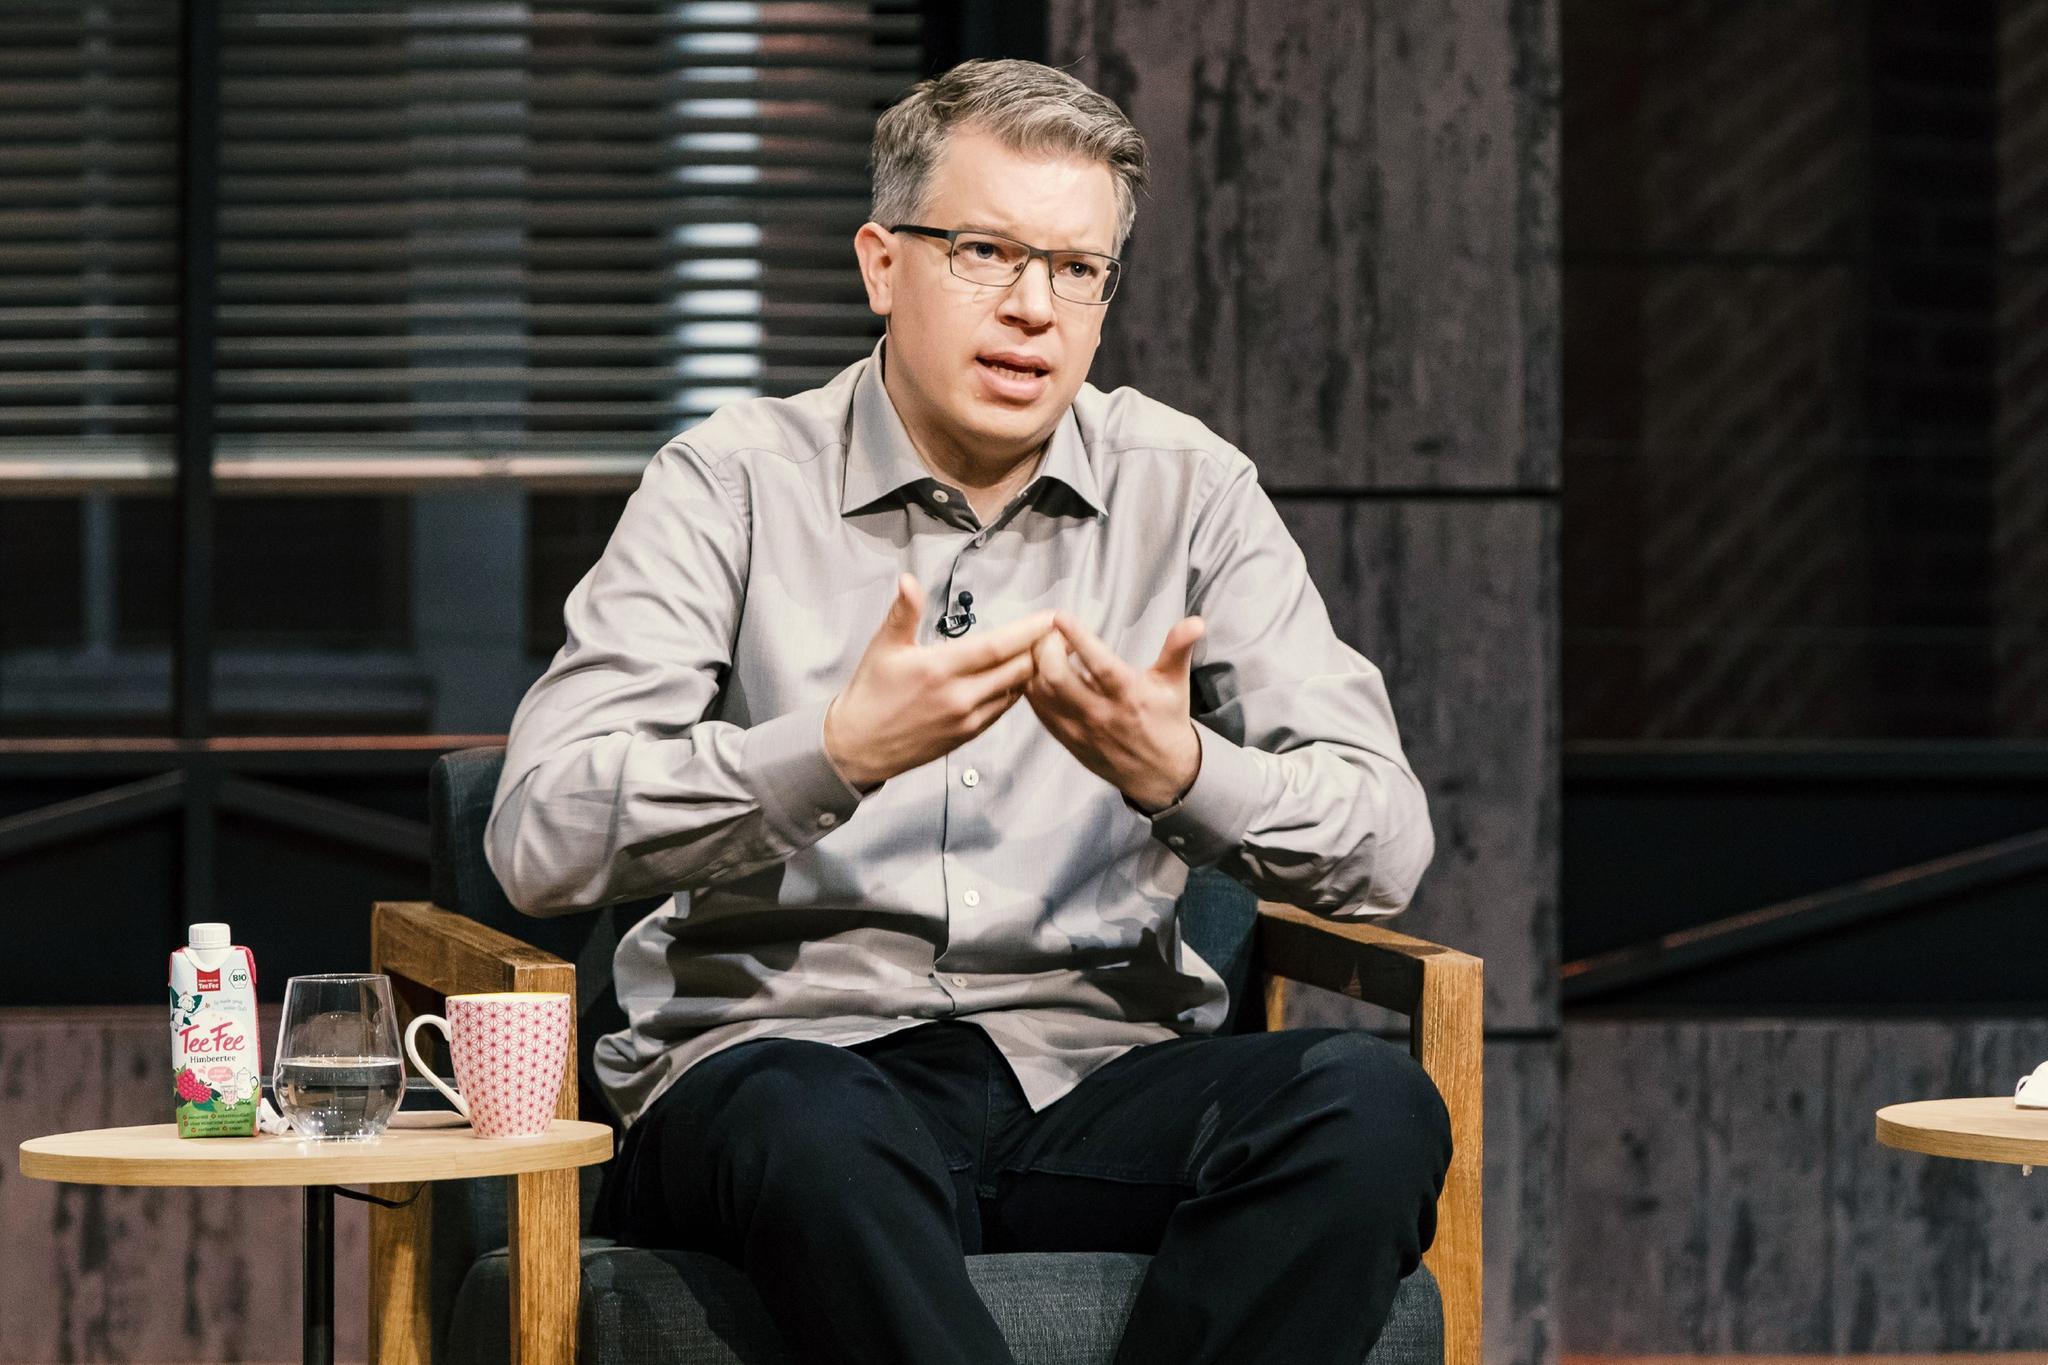 Frank Thelen